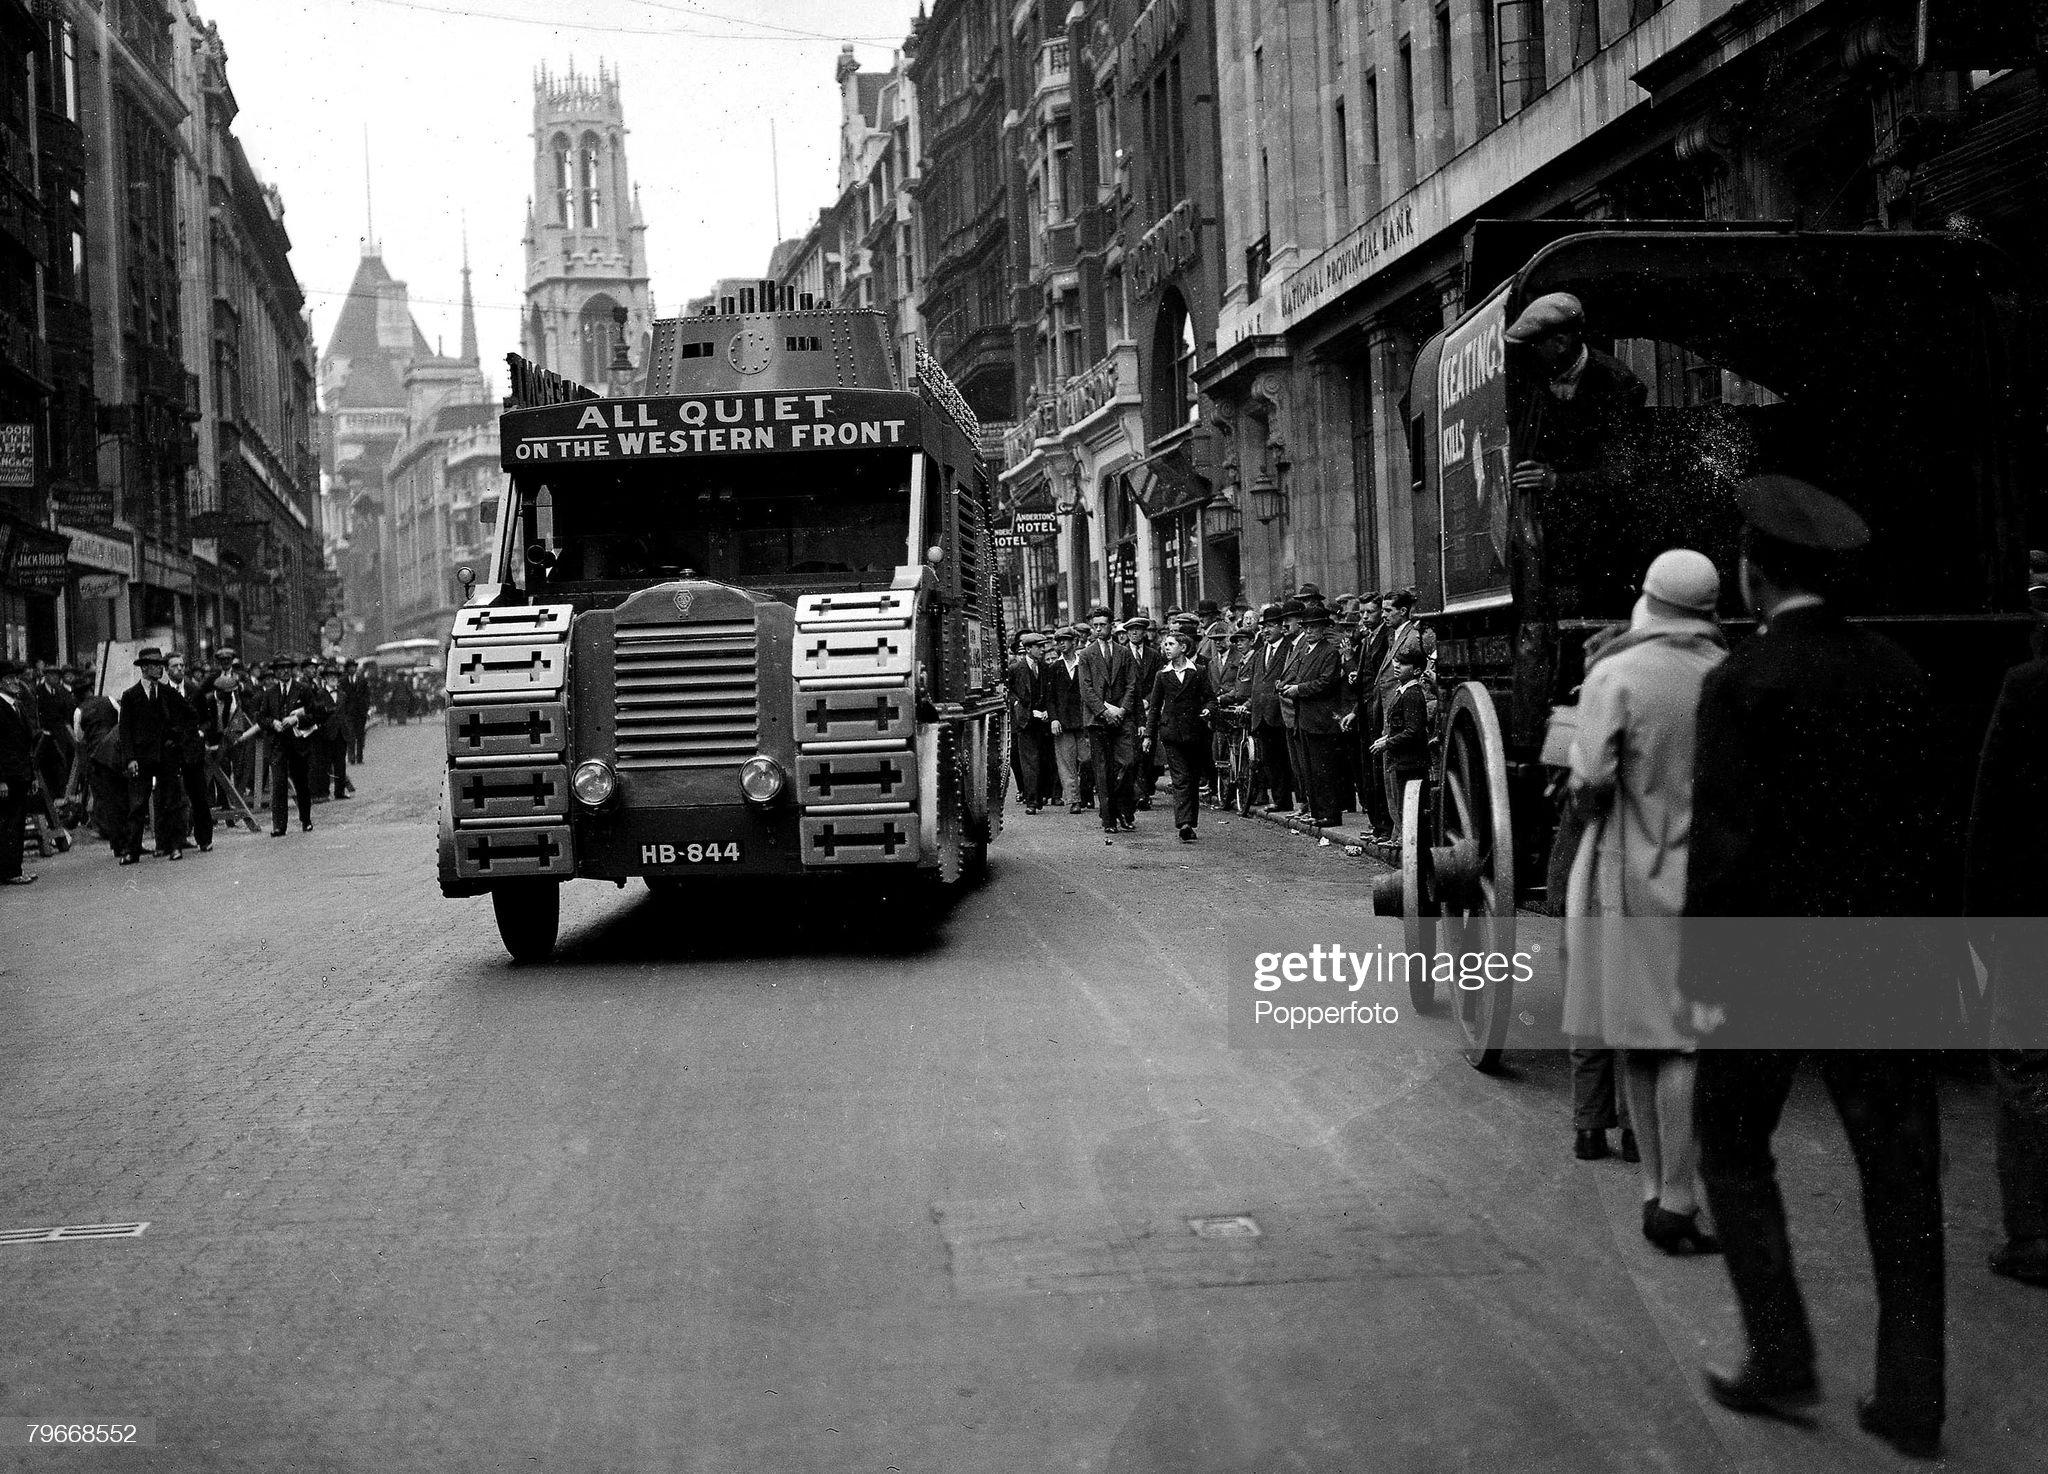 london-england-8th-july-a-tank-driving-d